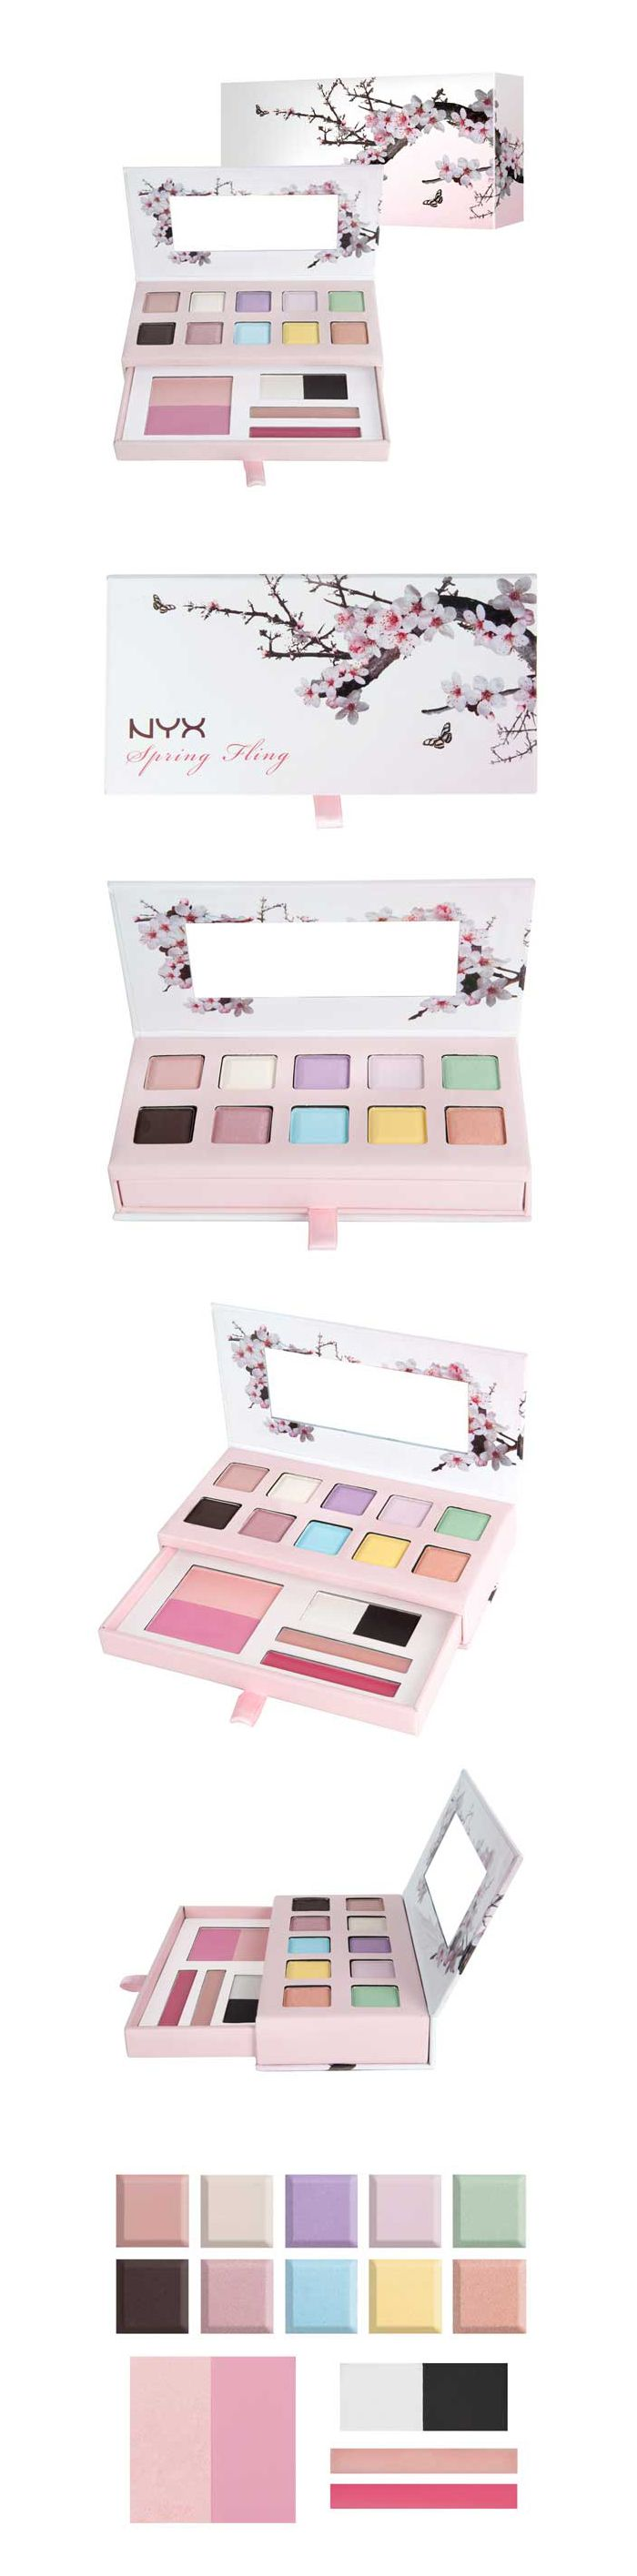 NYX Spring Fling | NYX Cosmetics